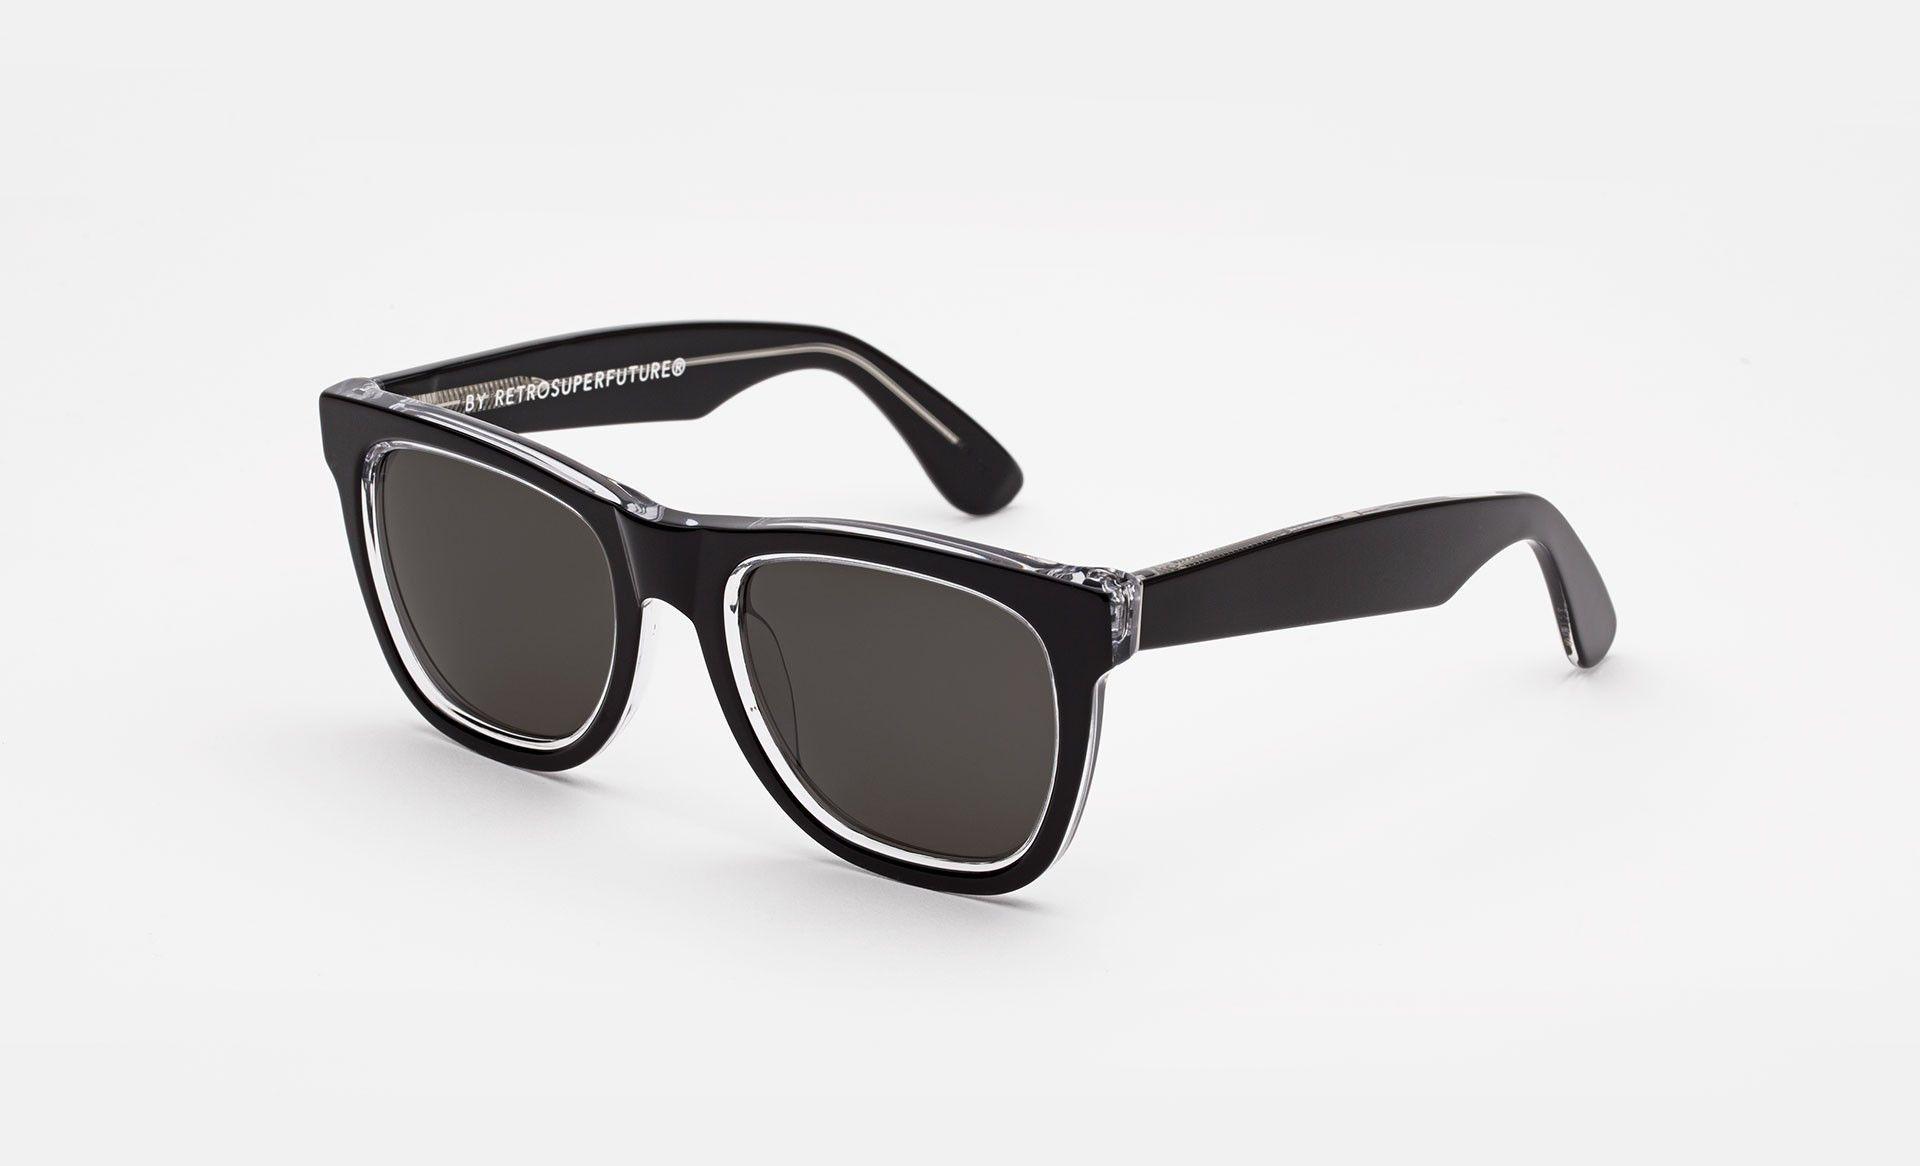 Super - Classic Achromatic Sunglasses   Sunglasses   Pinterest 01aa3a014360